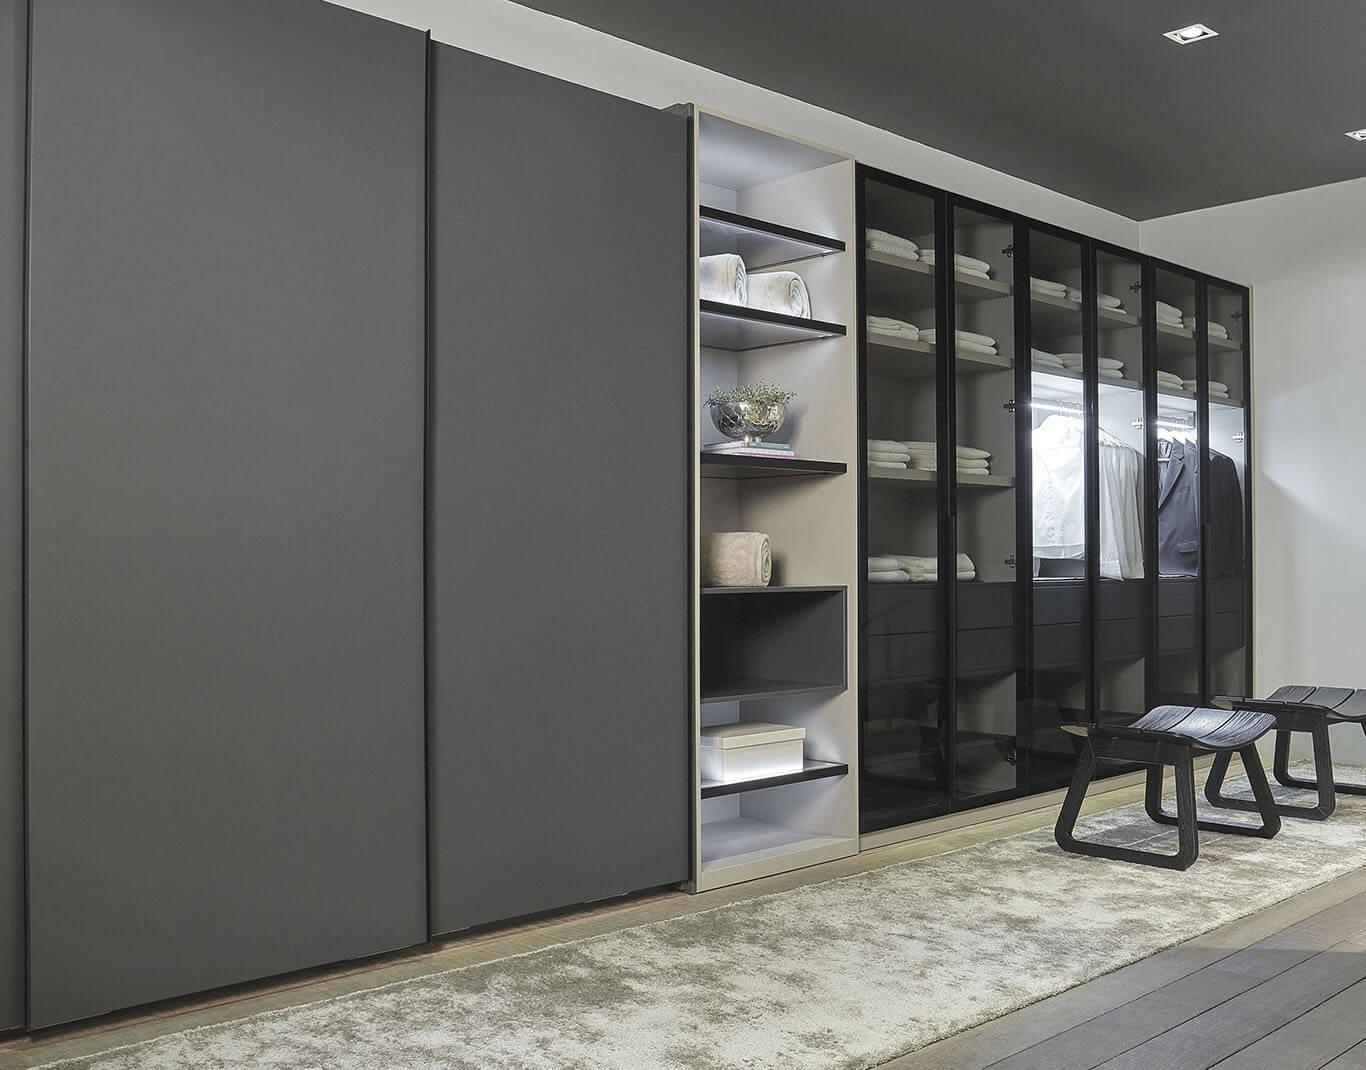 Dell Anno - Dormitório Ideias e Projetos12